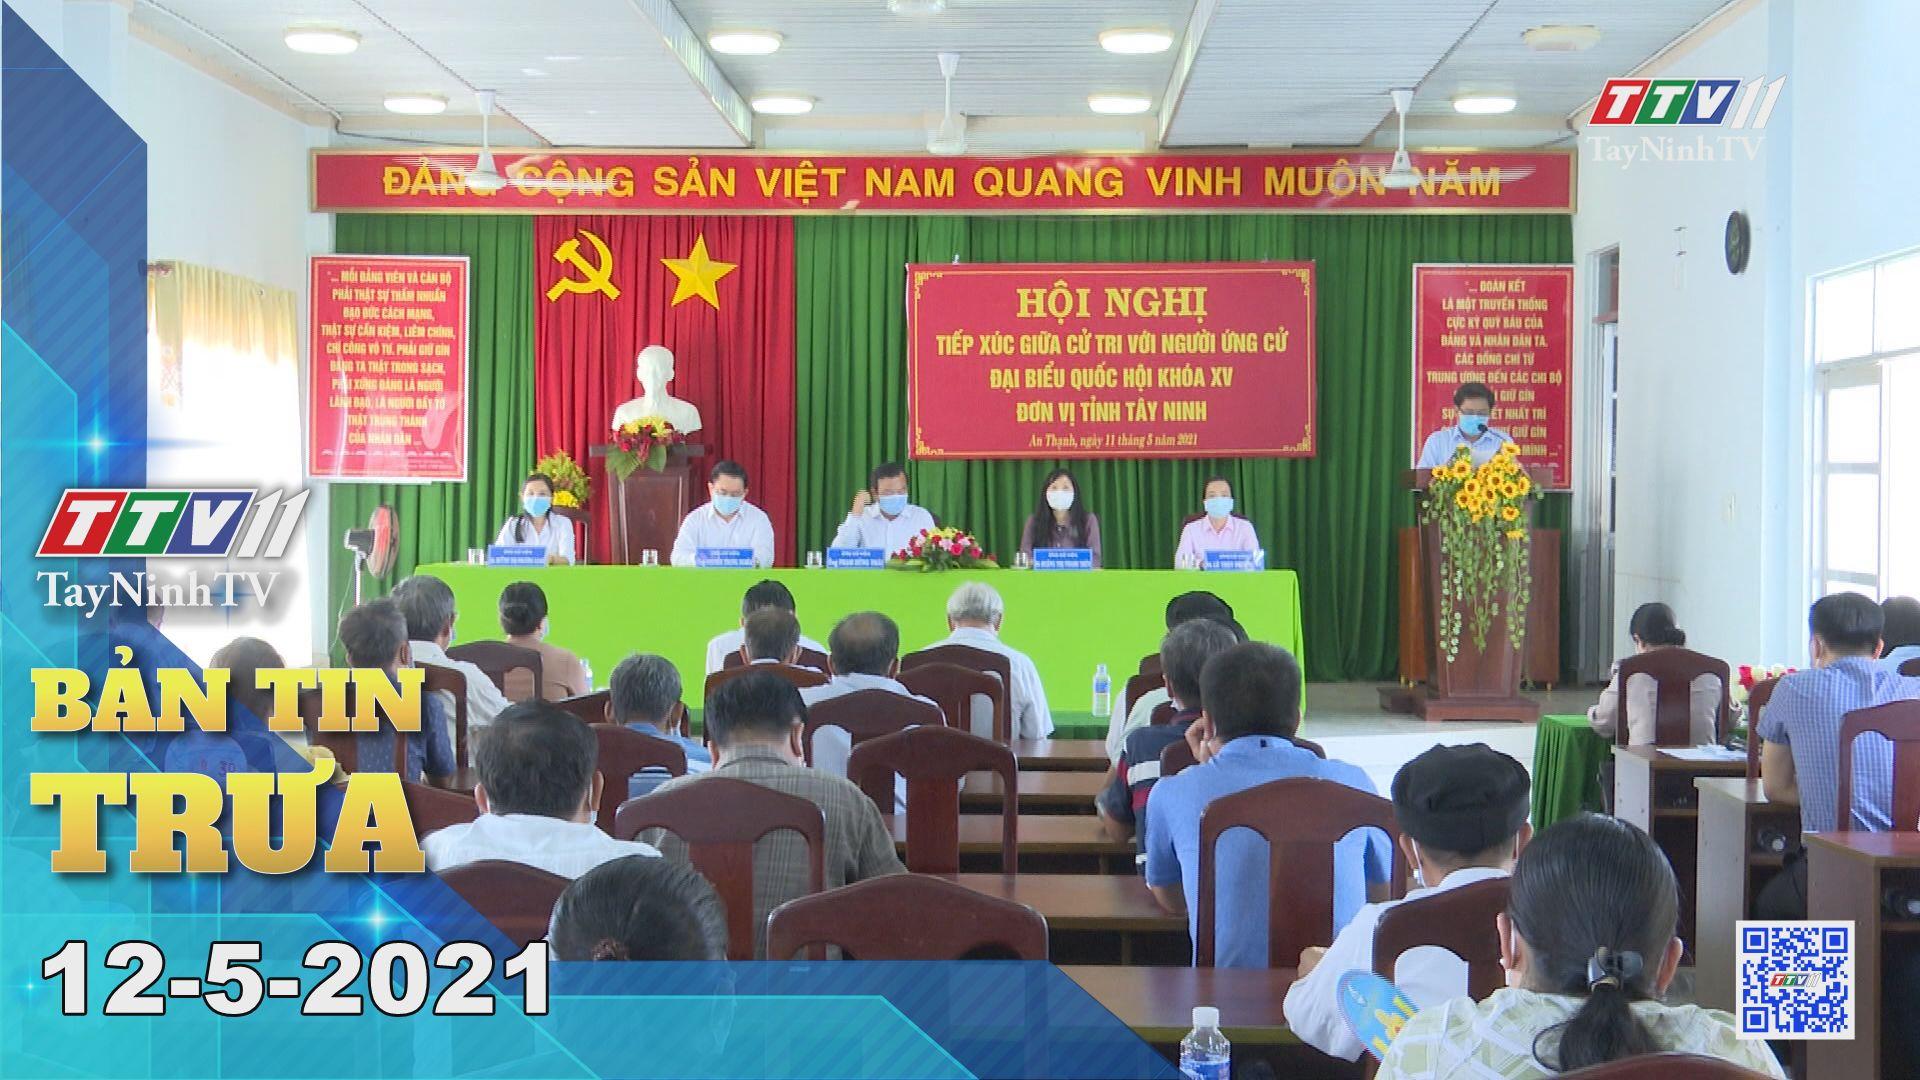 Bản tin trưa 12-5-2021 | Tin tức hôm nay | TayNinhTV